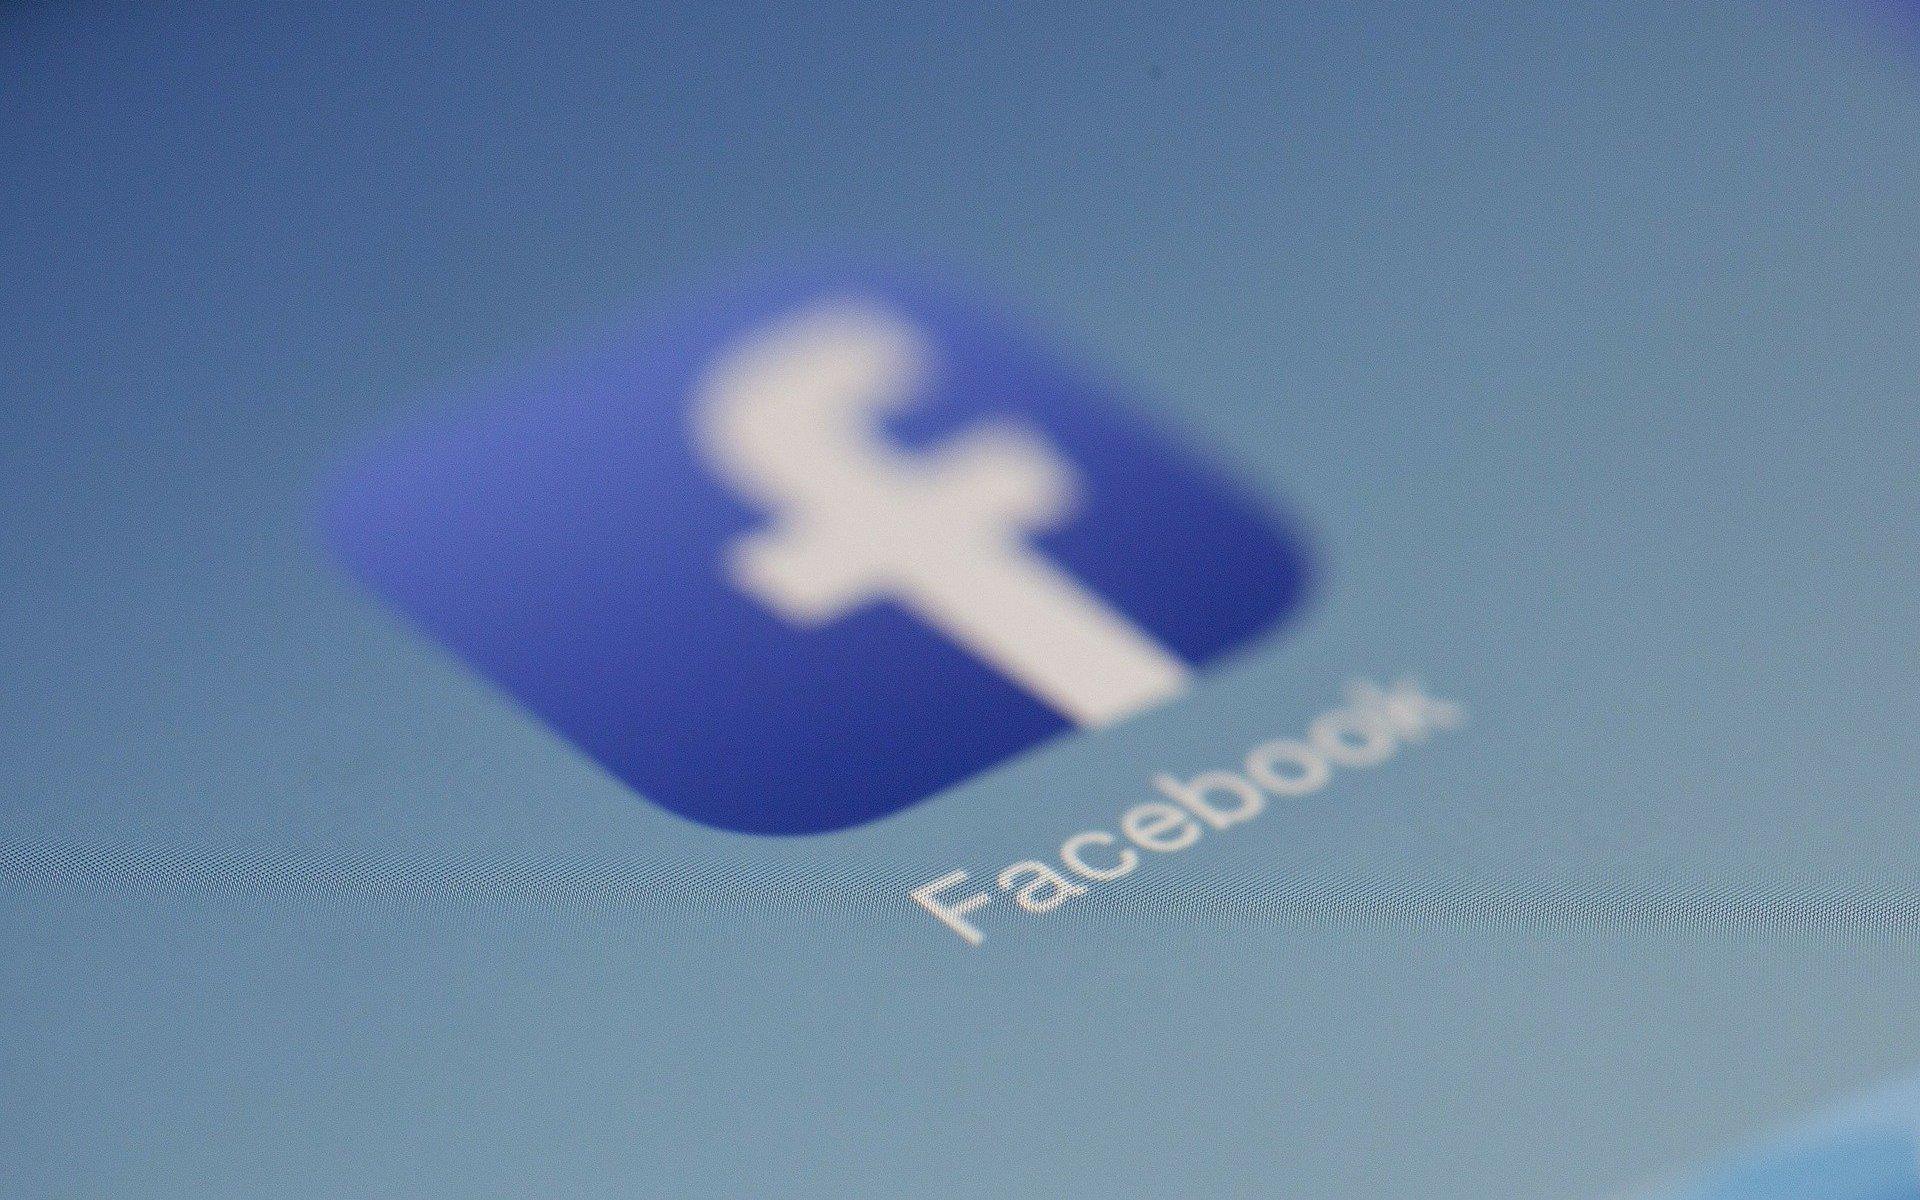 Blue Facebook app logo on a phone screen.